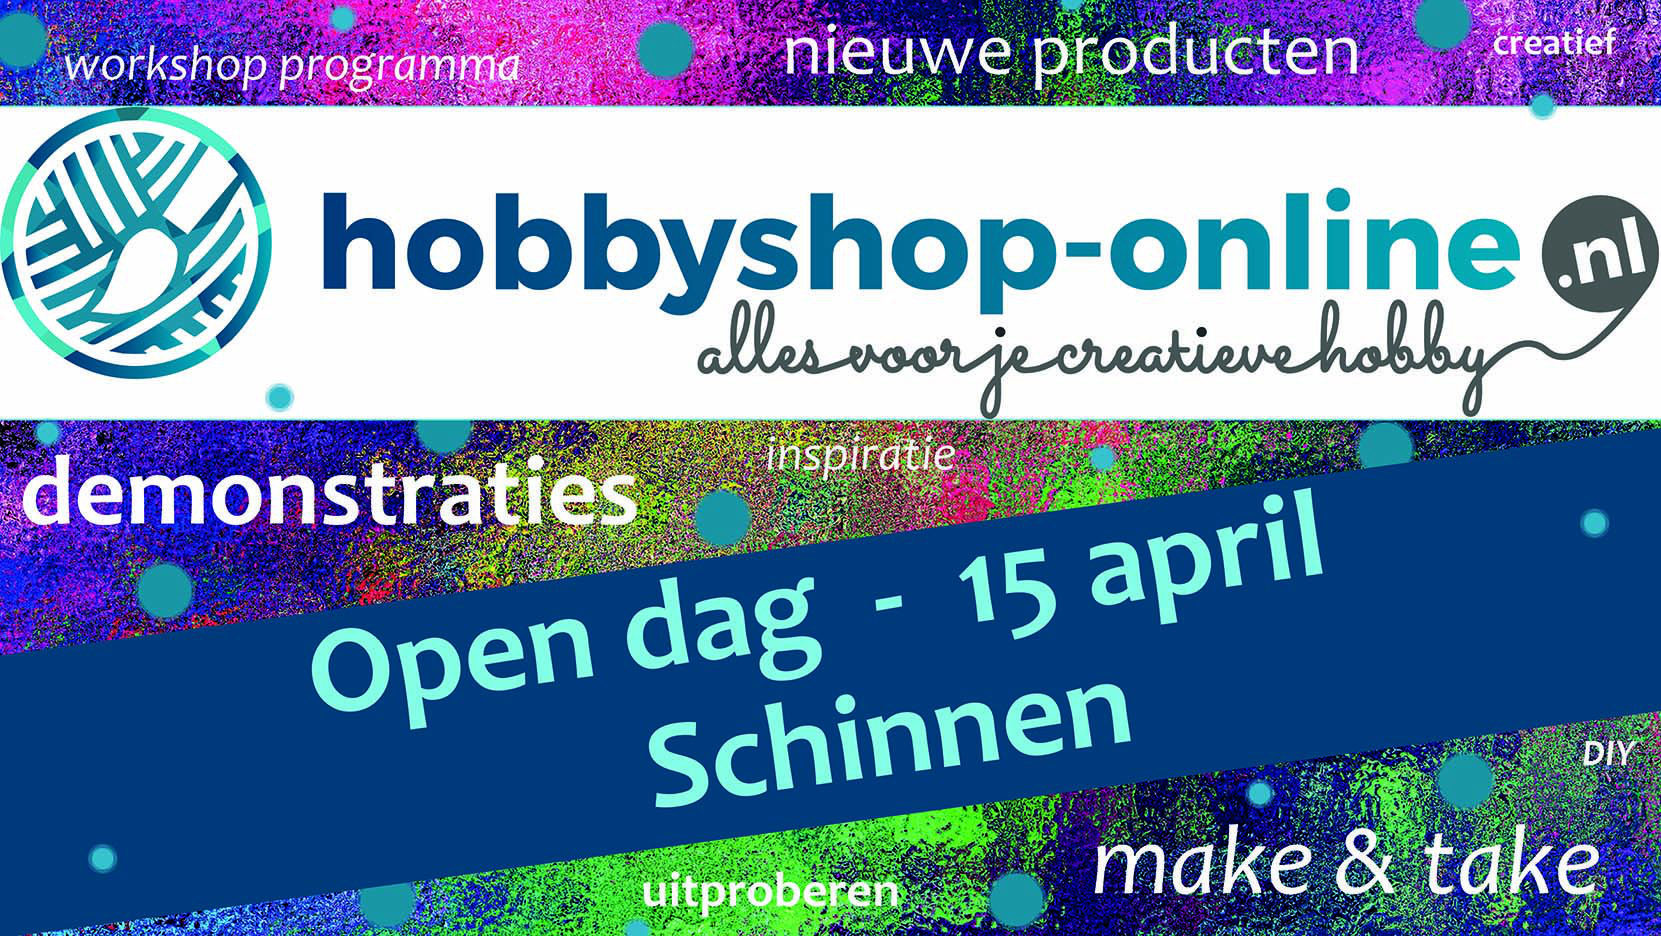 open-dag-hobbyshop-online-nl-15april-2018